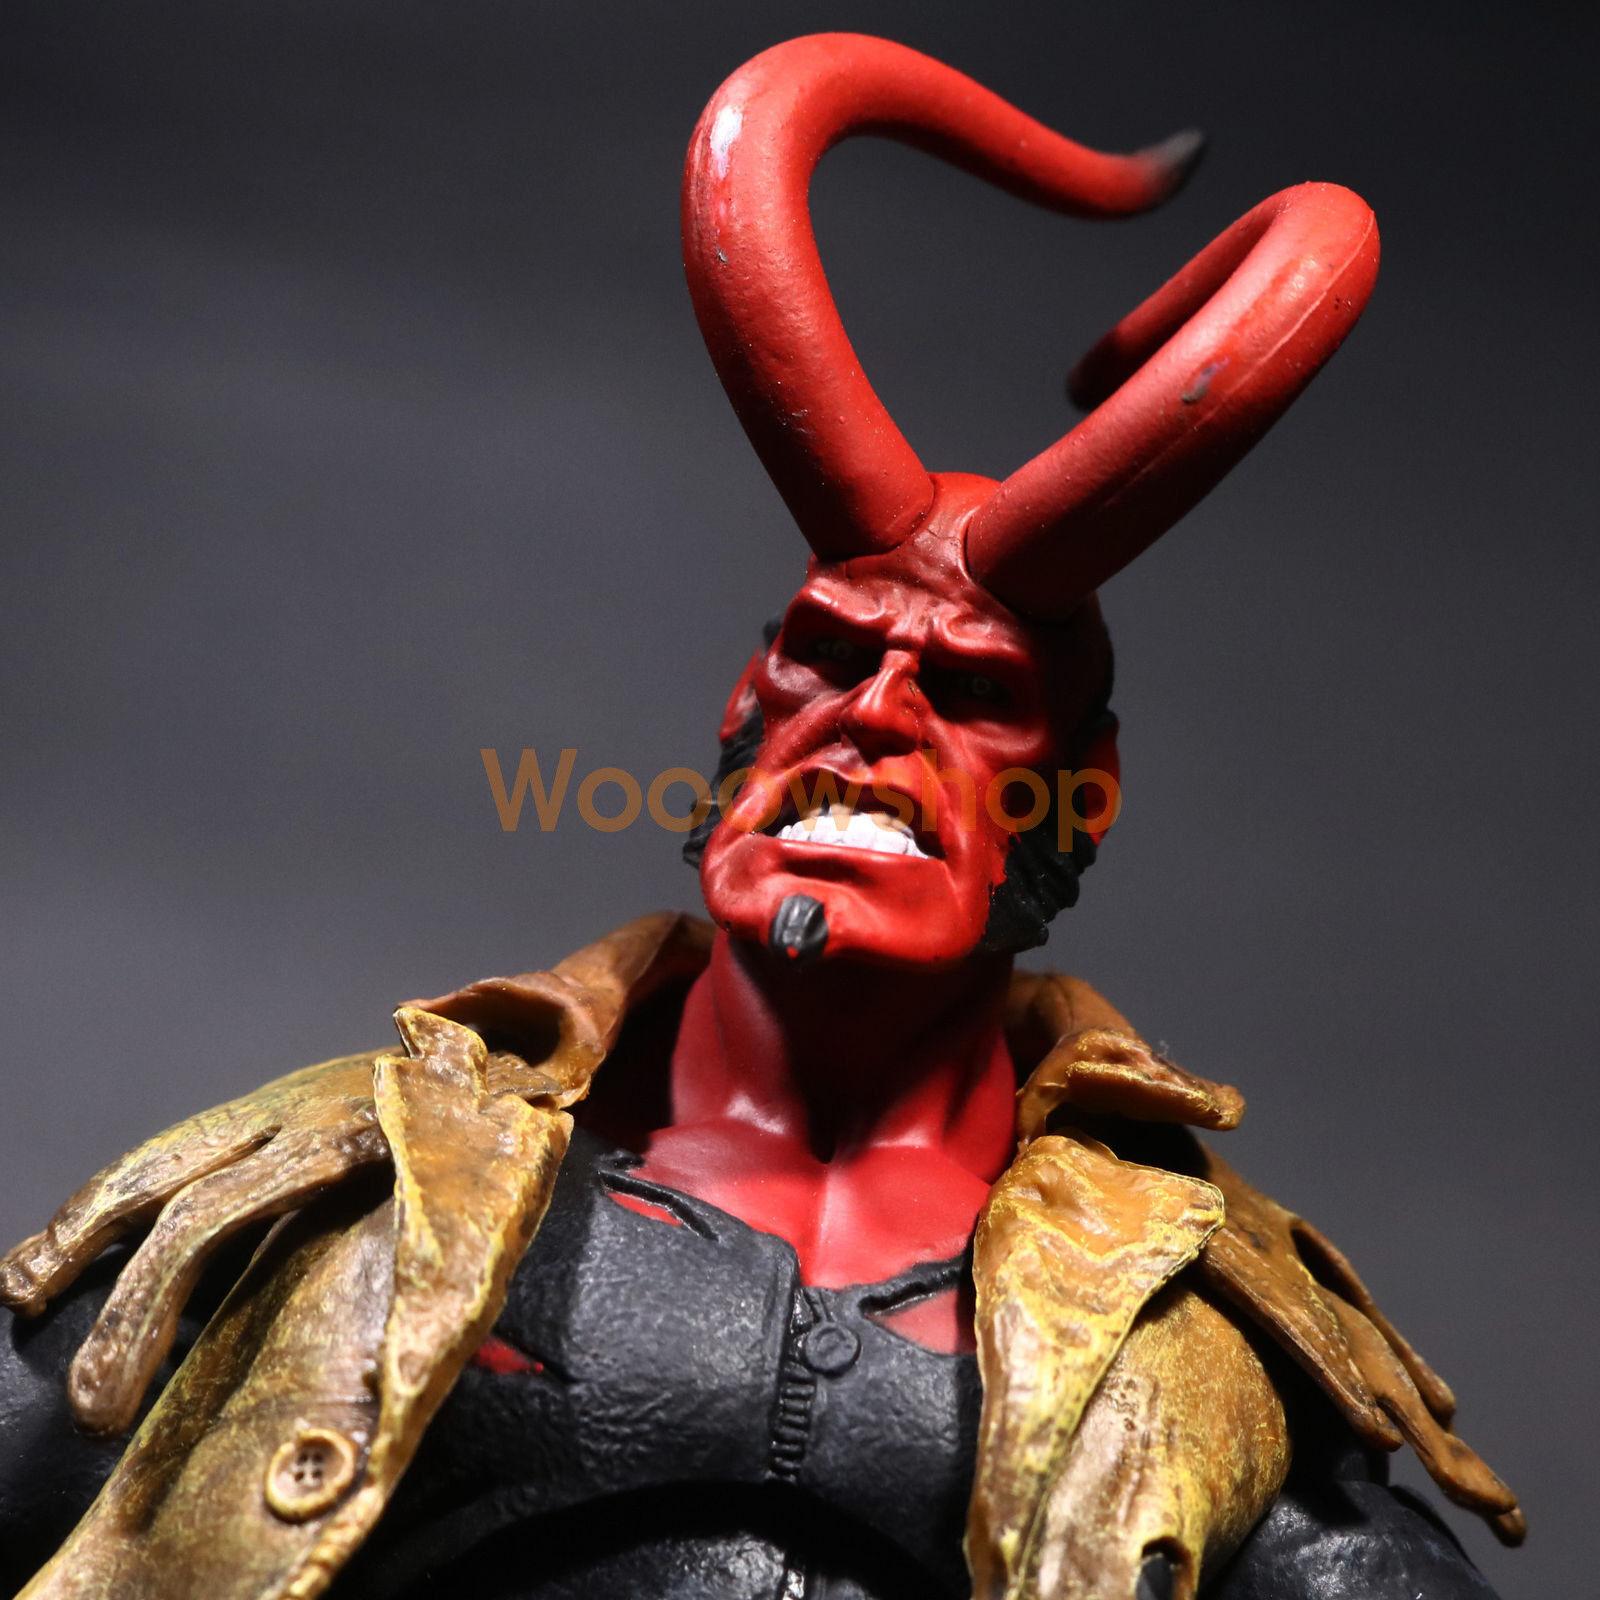 Hellboy Battle Damage Ver. Mezco HB 7  Action Figure Exclusive Collection No Box